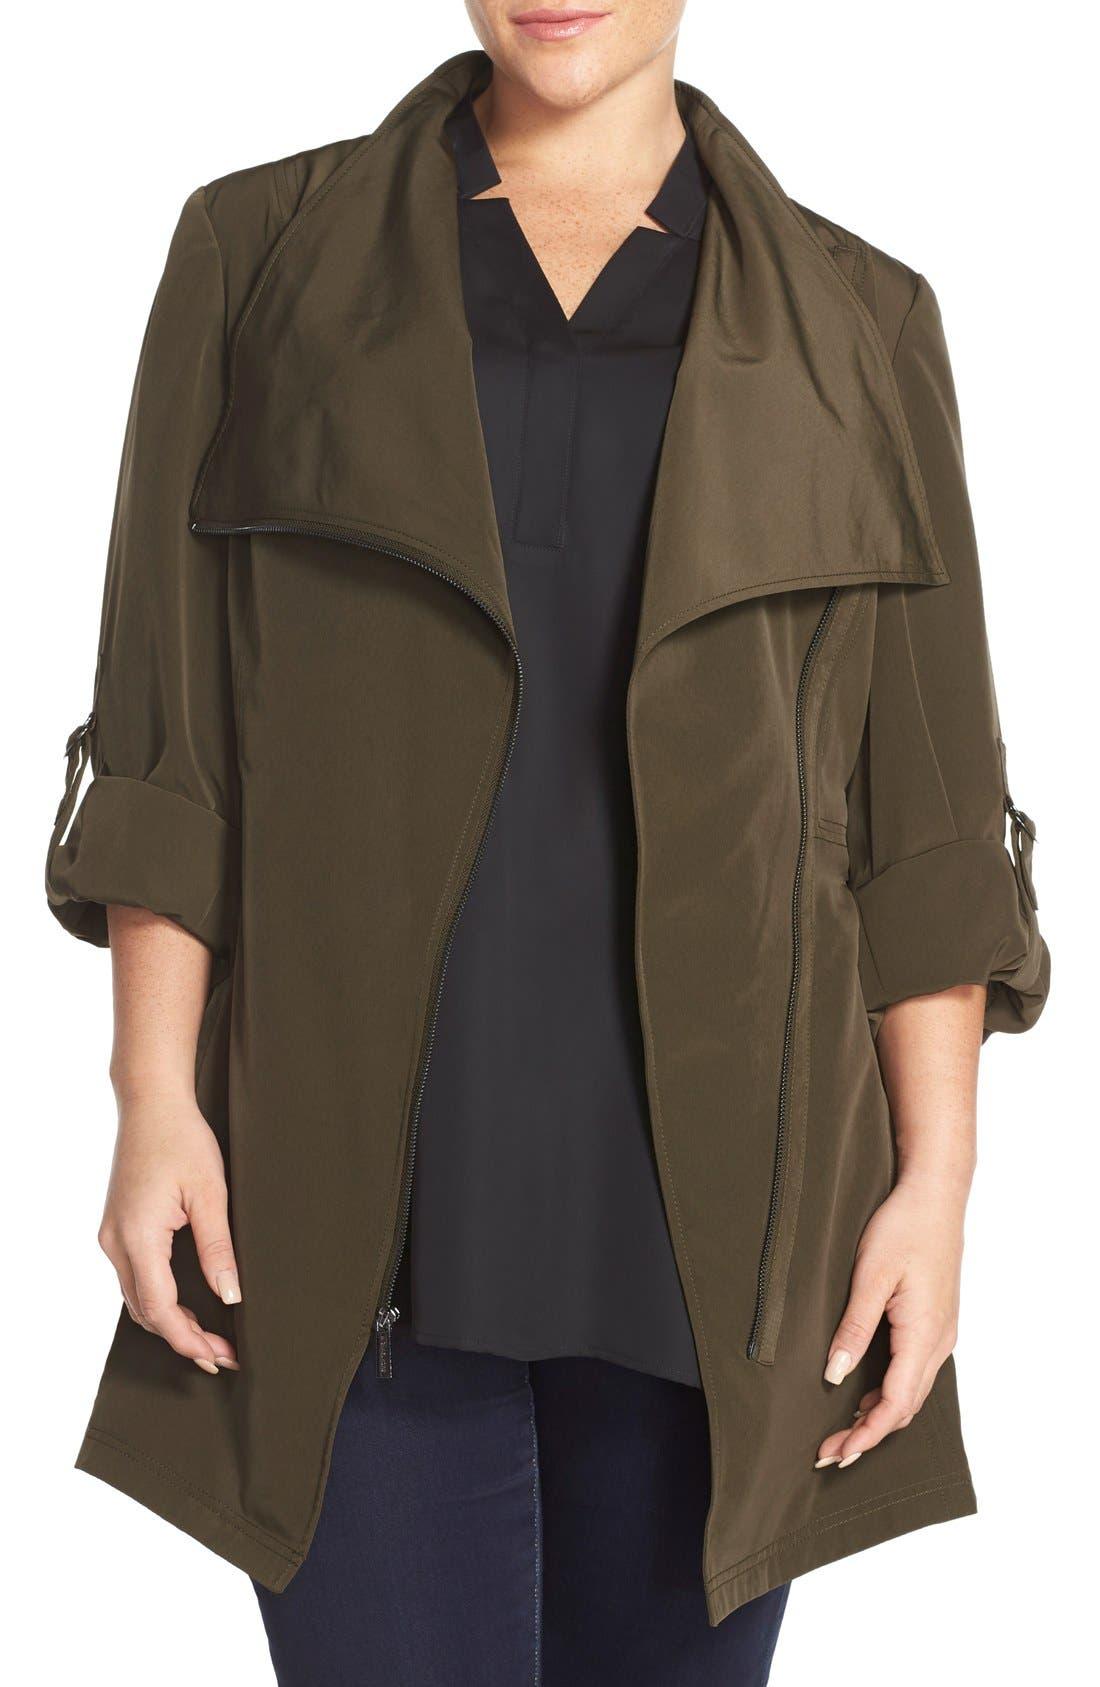 Alternate Image 1 Selected - MICHAEL Michael Kors Asymmetrical Zip Jacket (Plus Size)